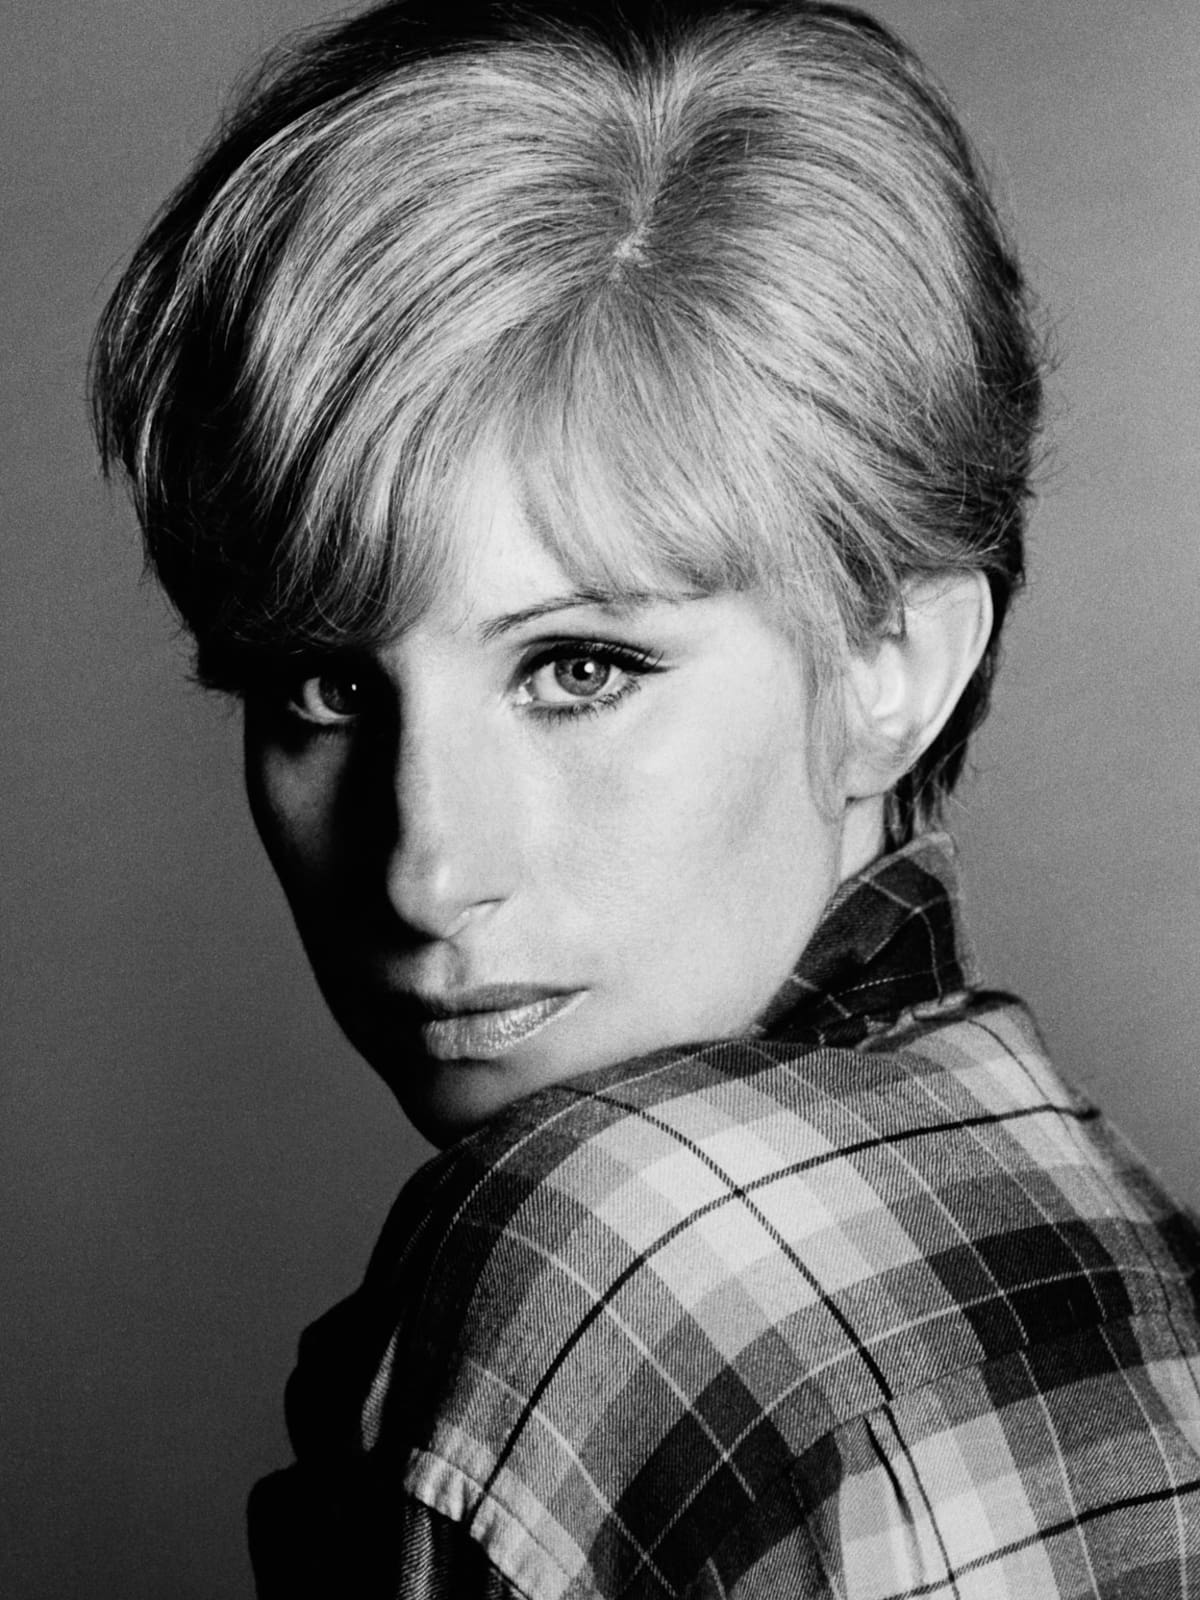 News_Greg Gorman_Barbra Streisand_Los Angeles_1981